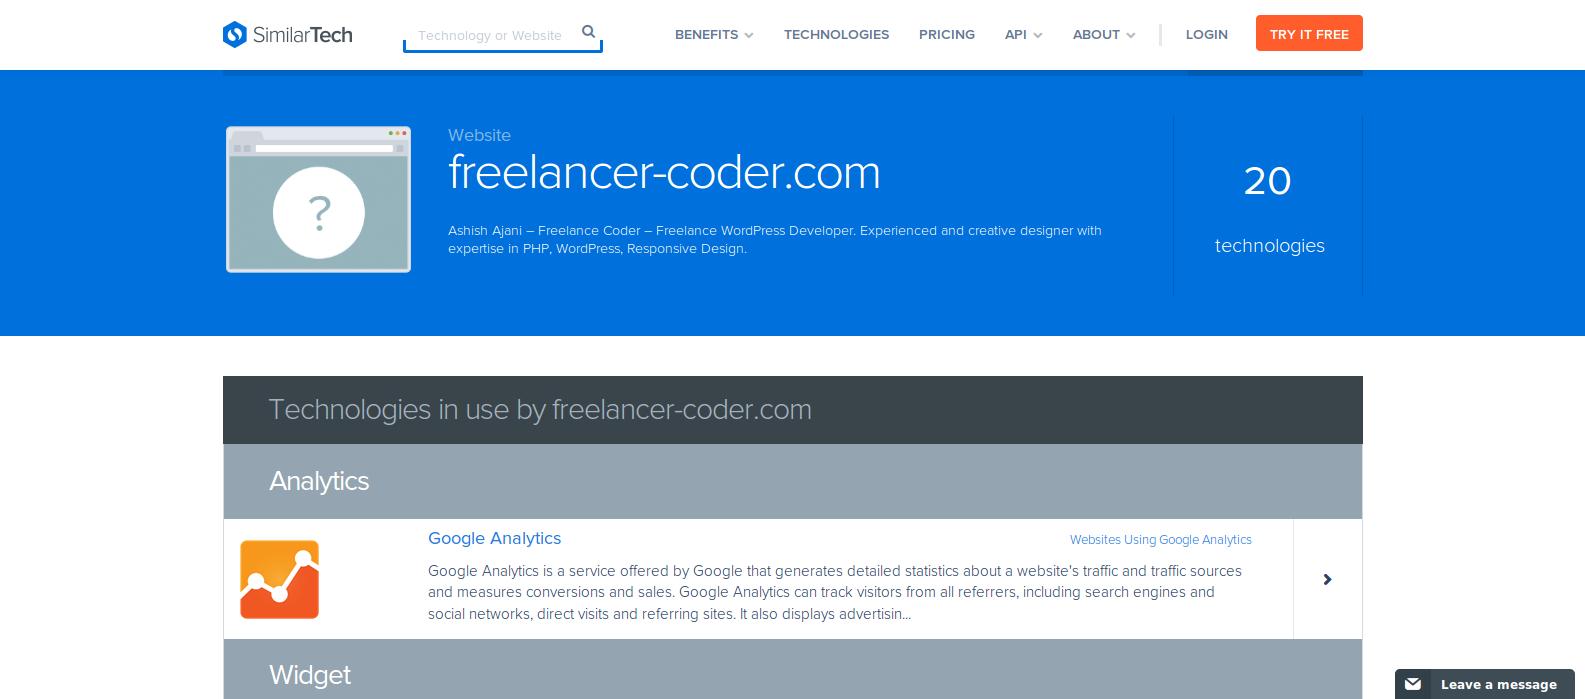 Determine-technologies-a-website-built-on-using-SimilarTech